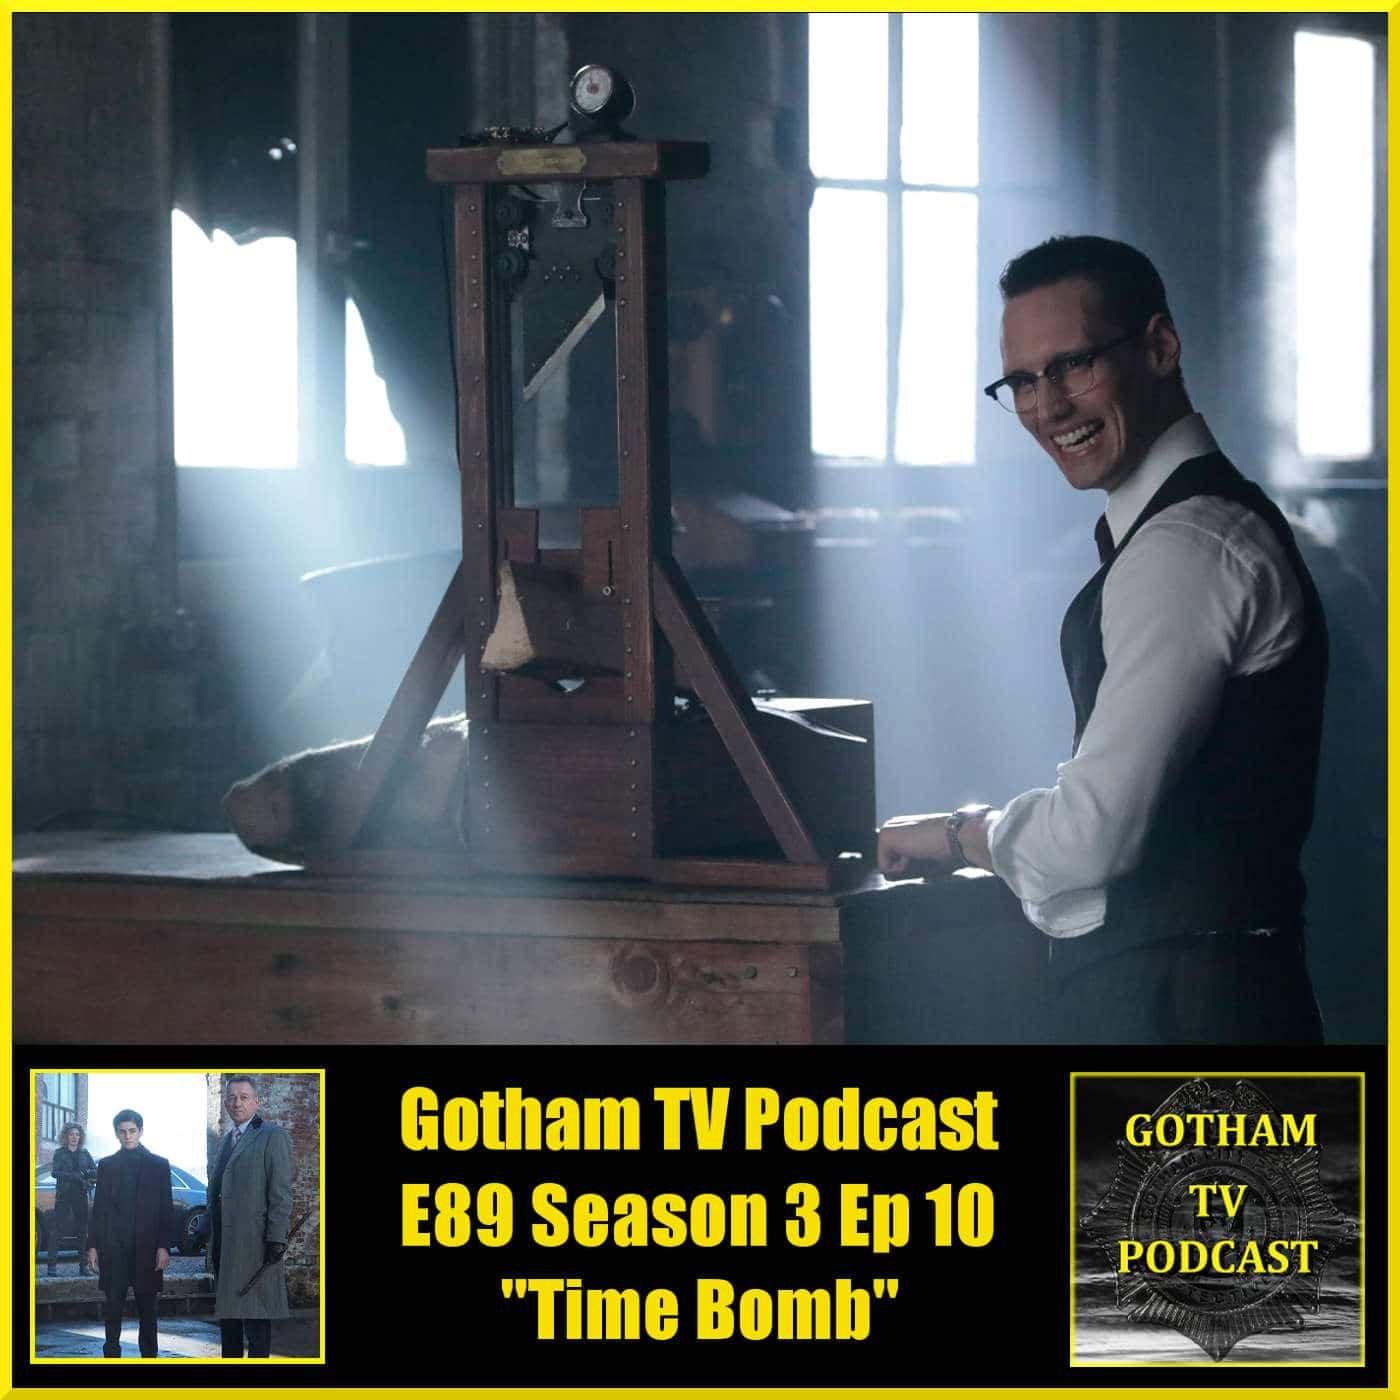 Rush season 1 episode 10 2014 - Gotham Season 3 Episode 10 Review Time Bomb Gotham Tv Podcast Episode 89